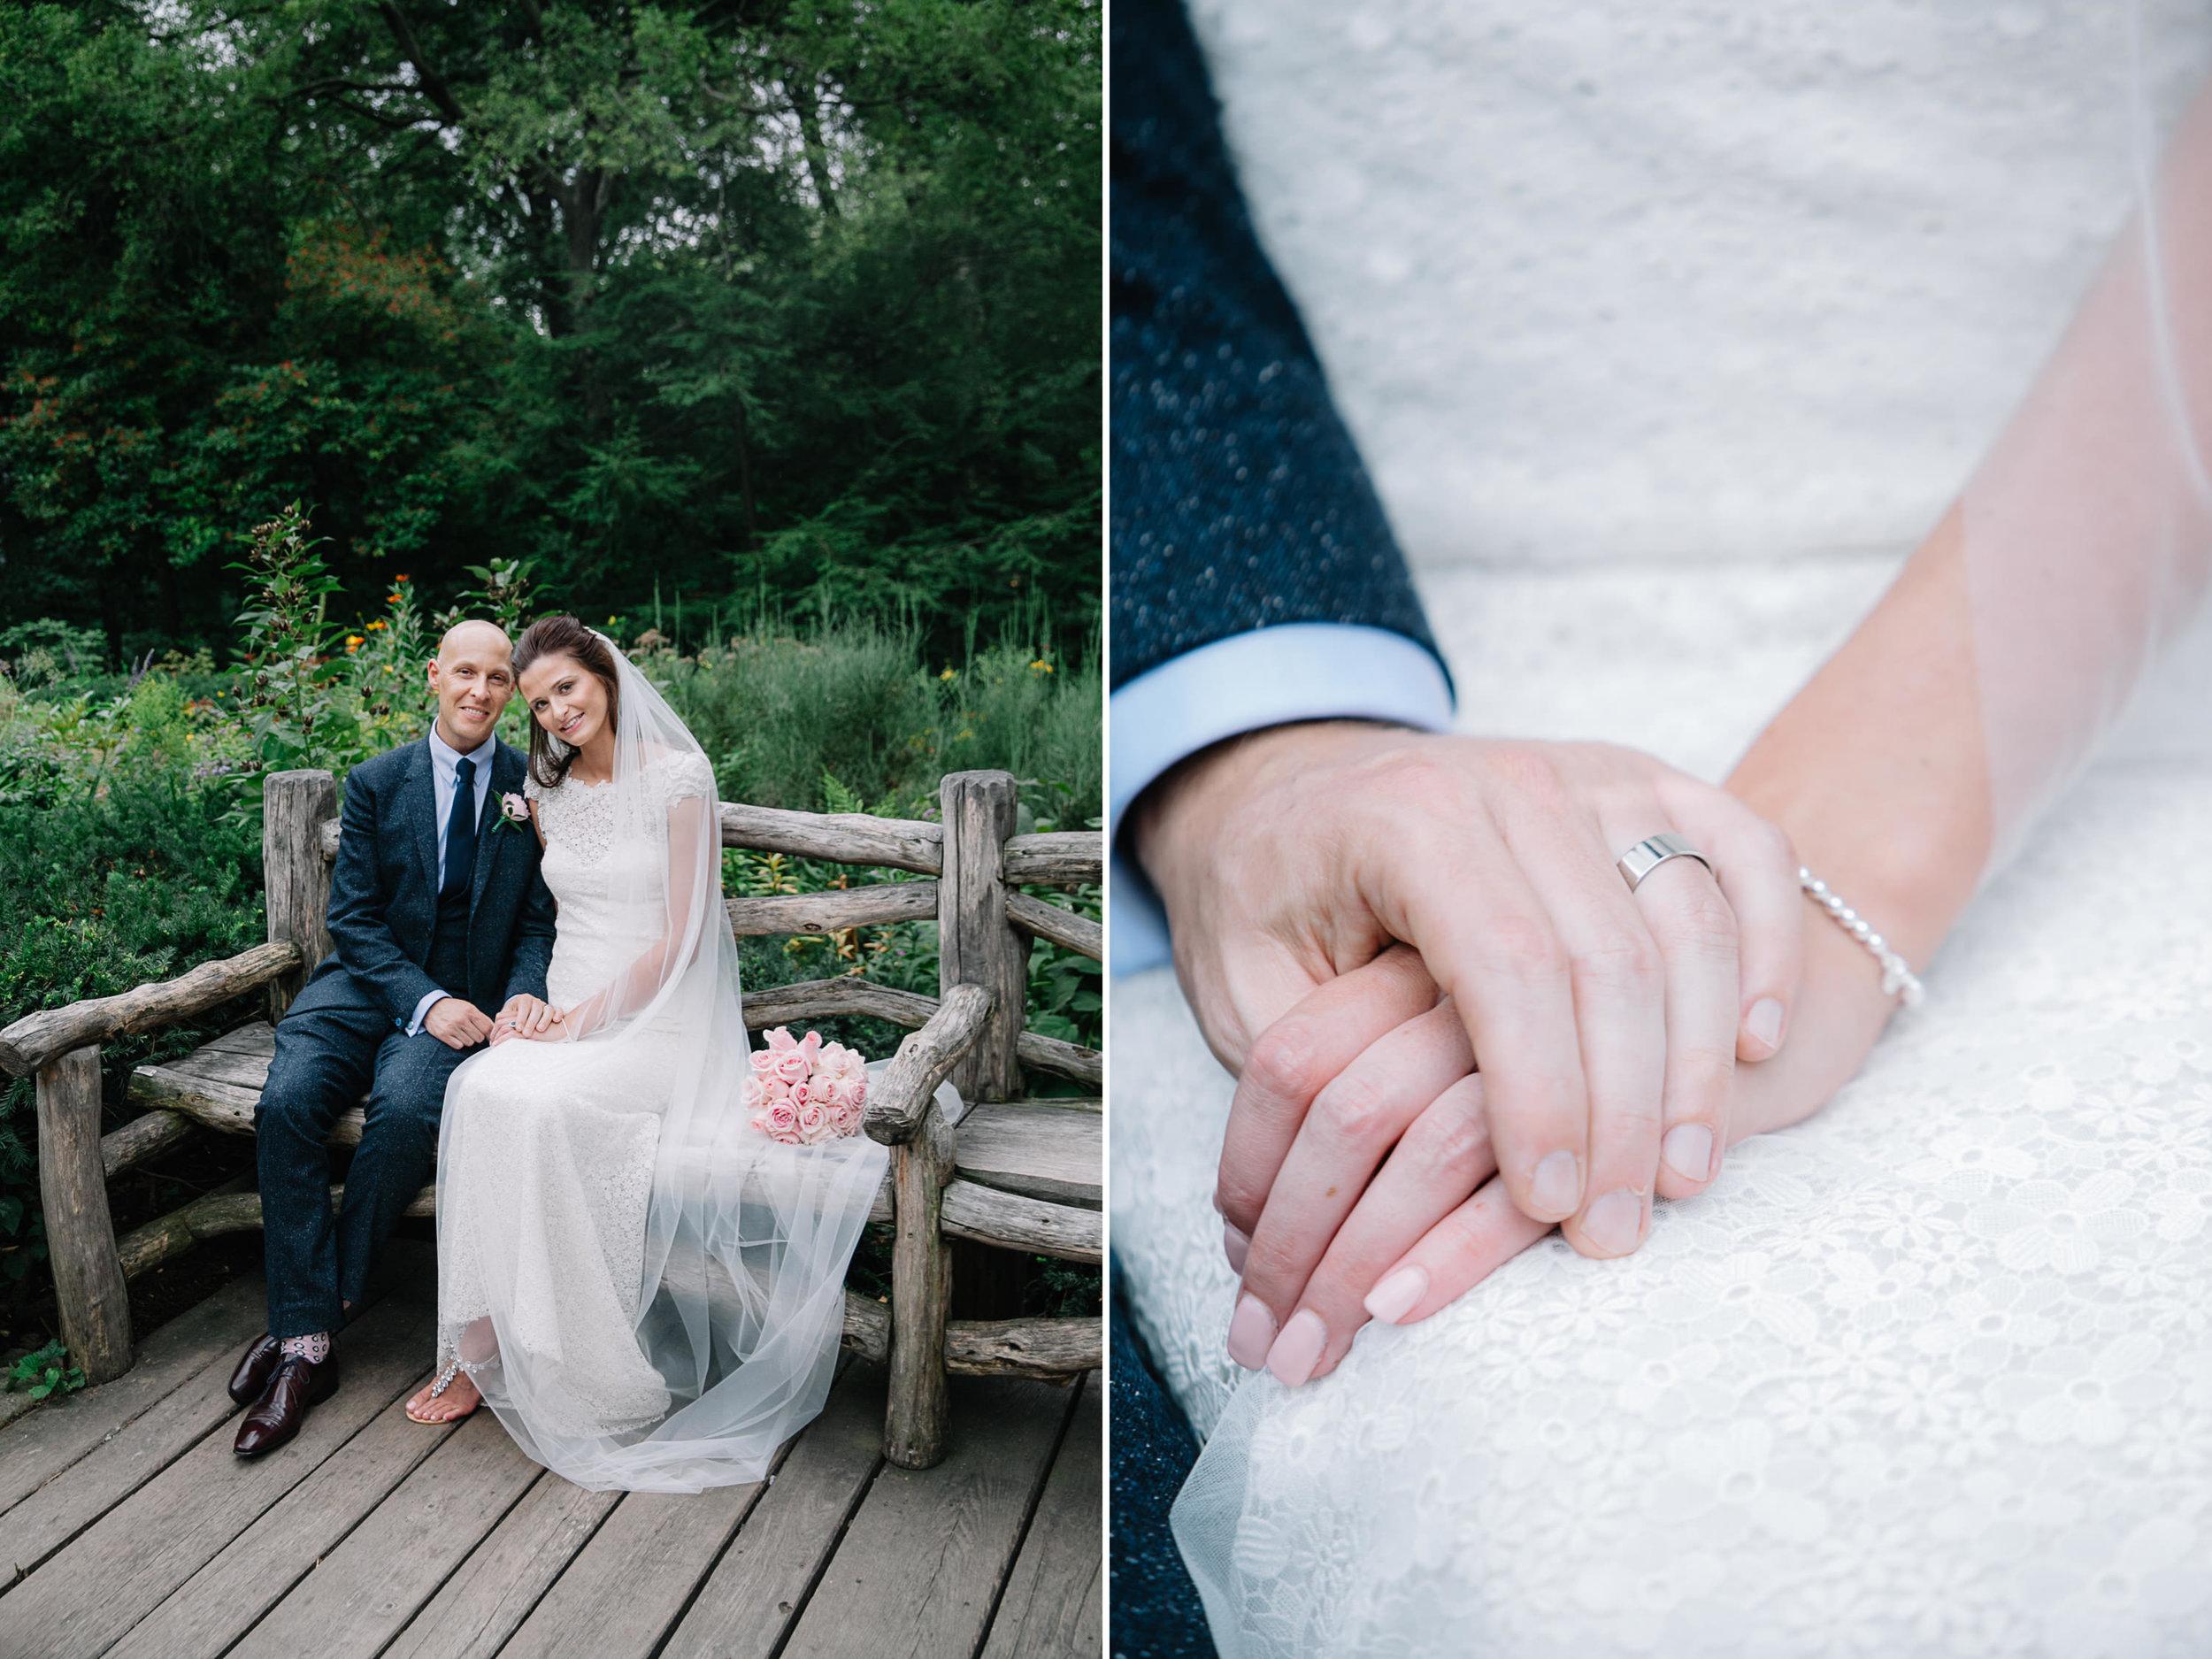 Shakespeare-garden-central-park-intimate-wedding-17-.jpg